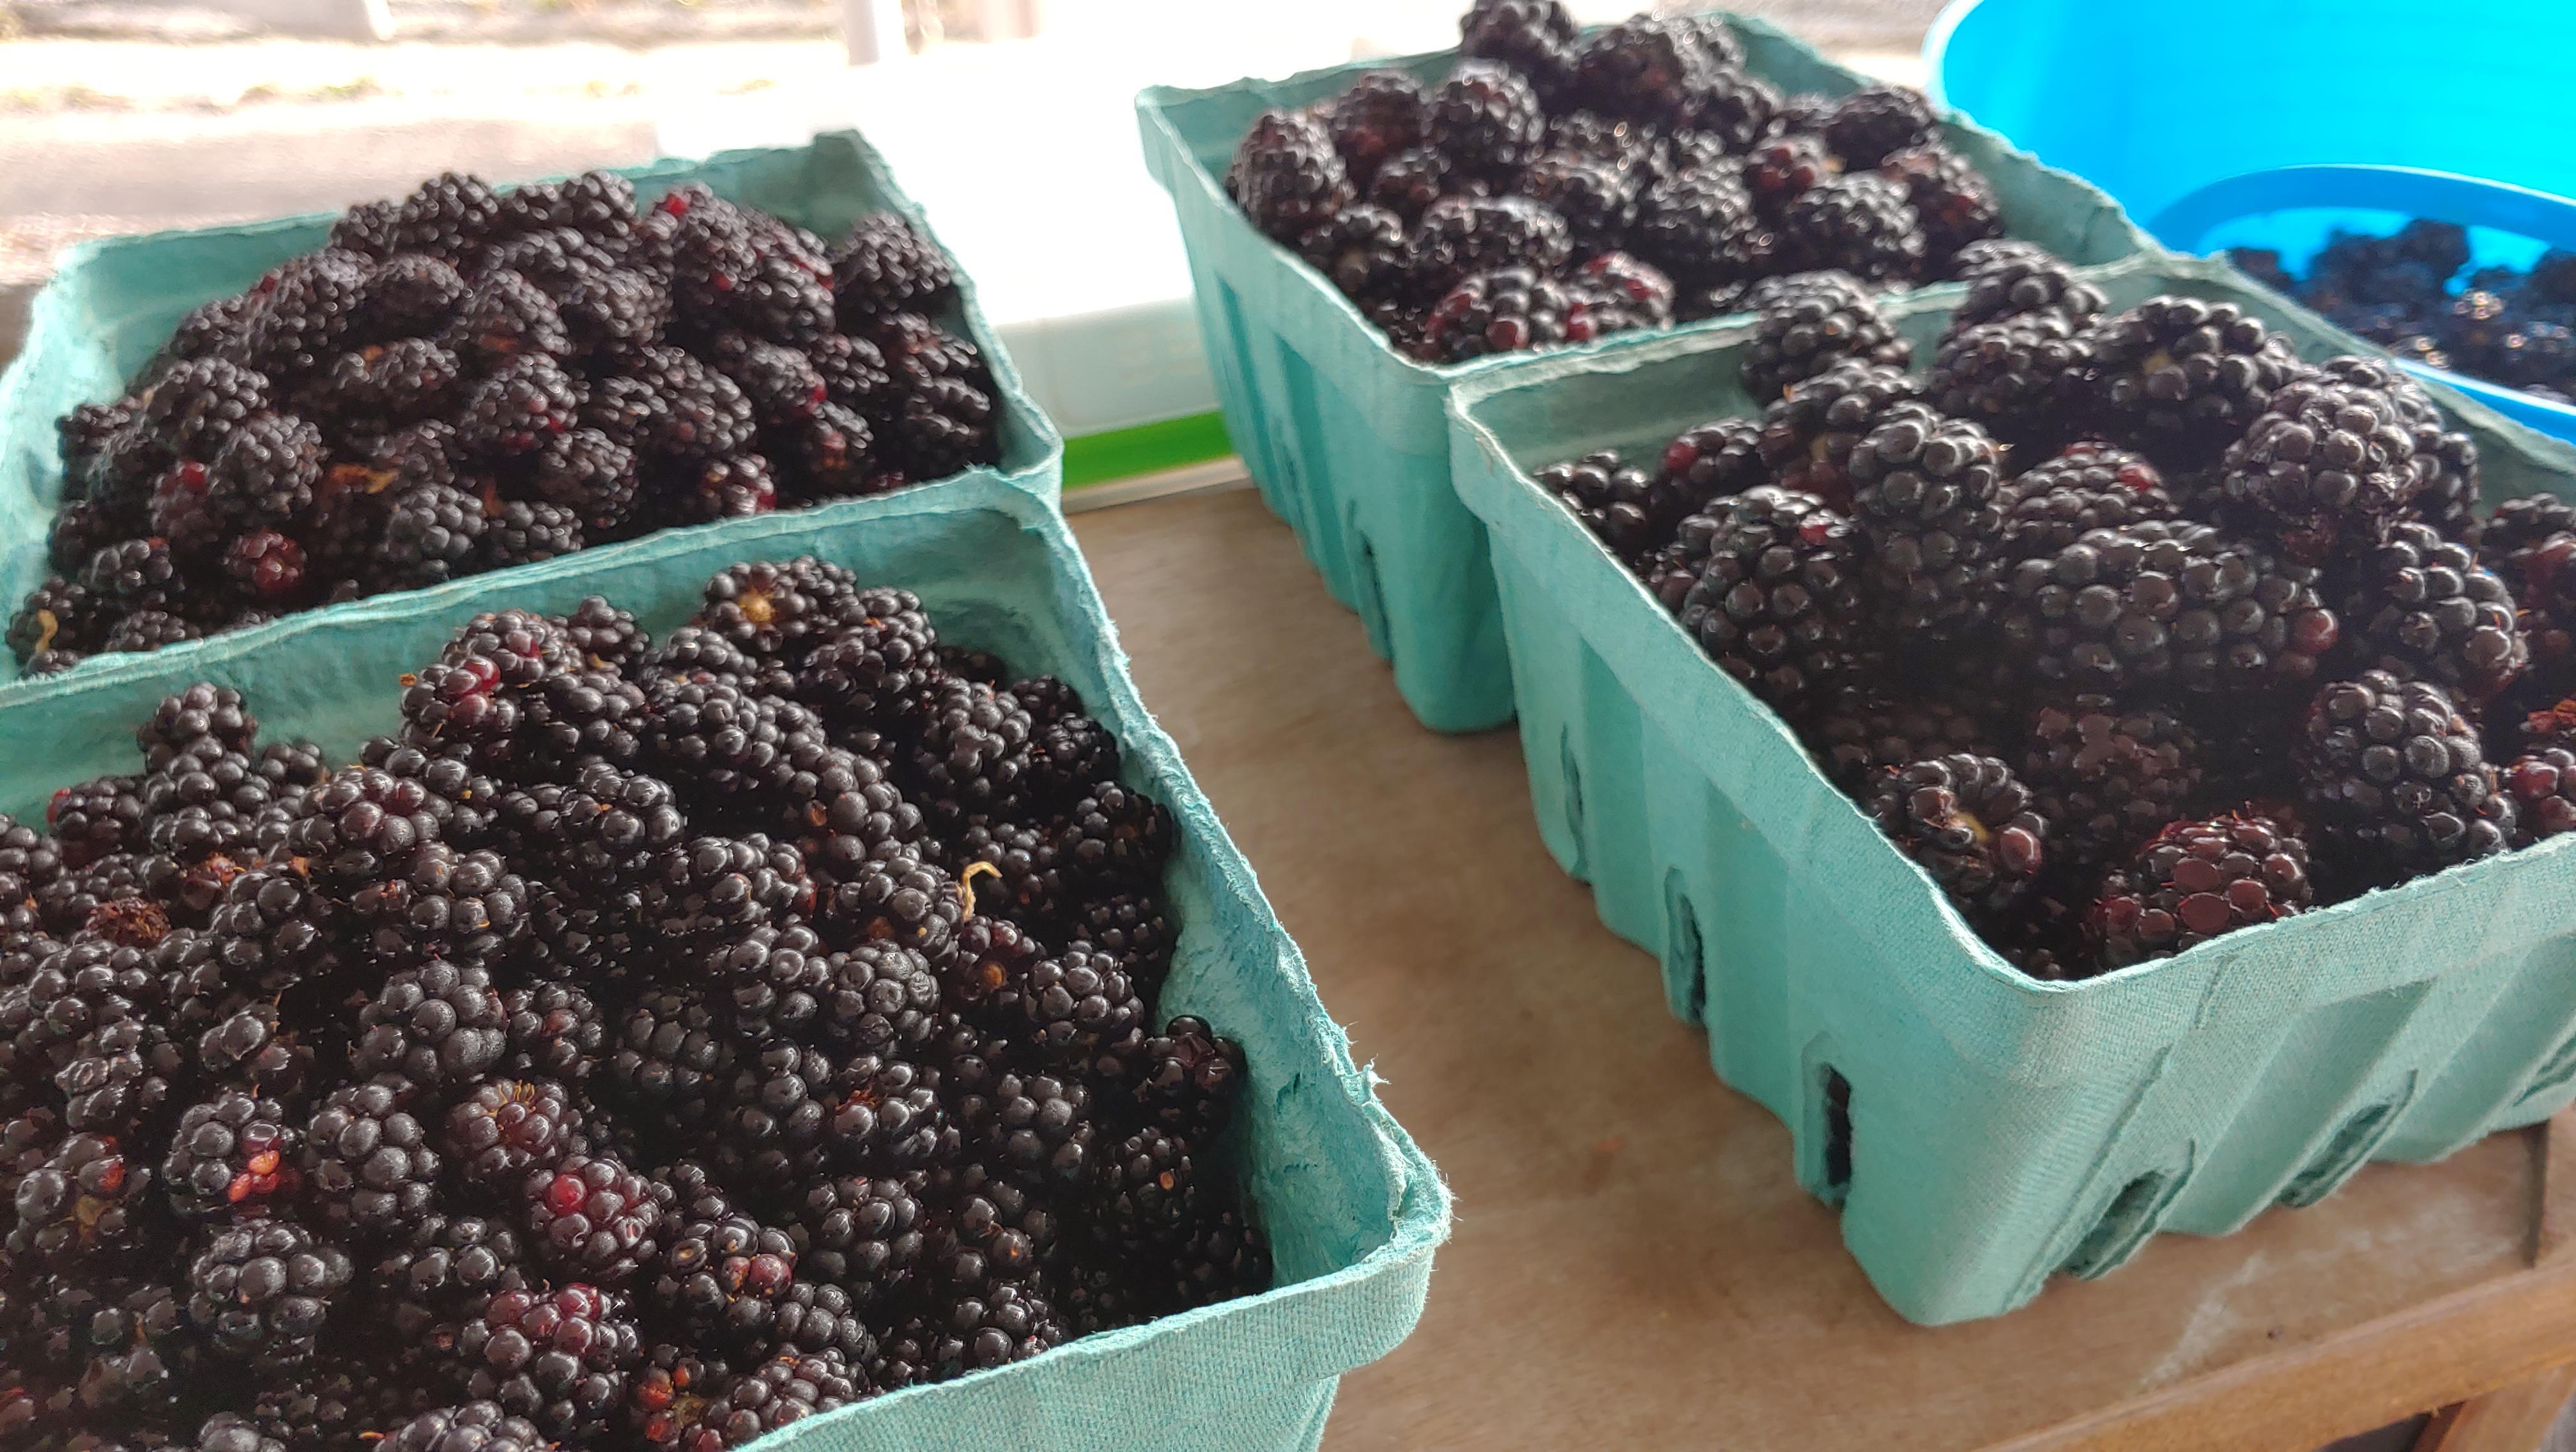 Wild Blackberry on the left - Thornless Blackberry on the right